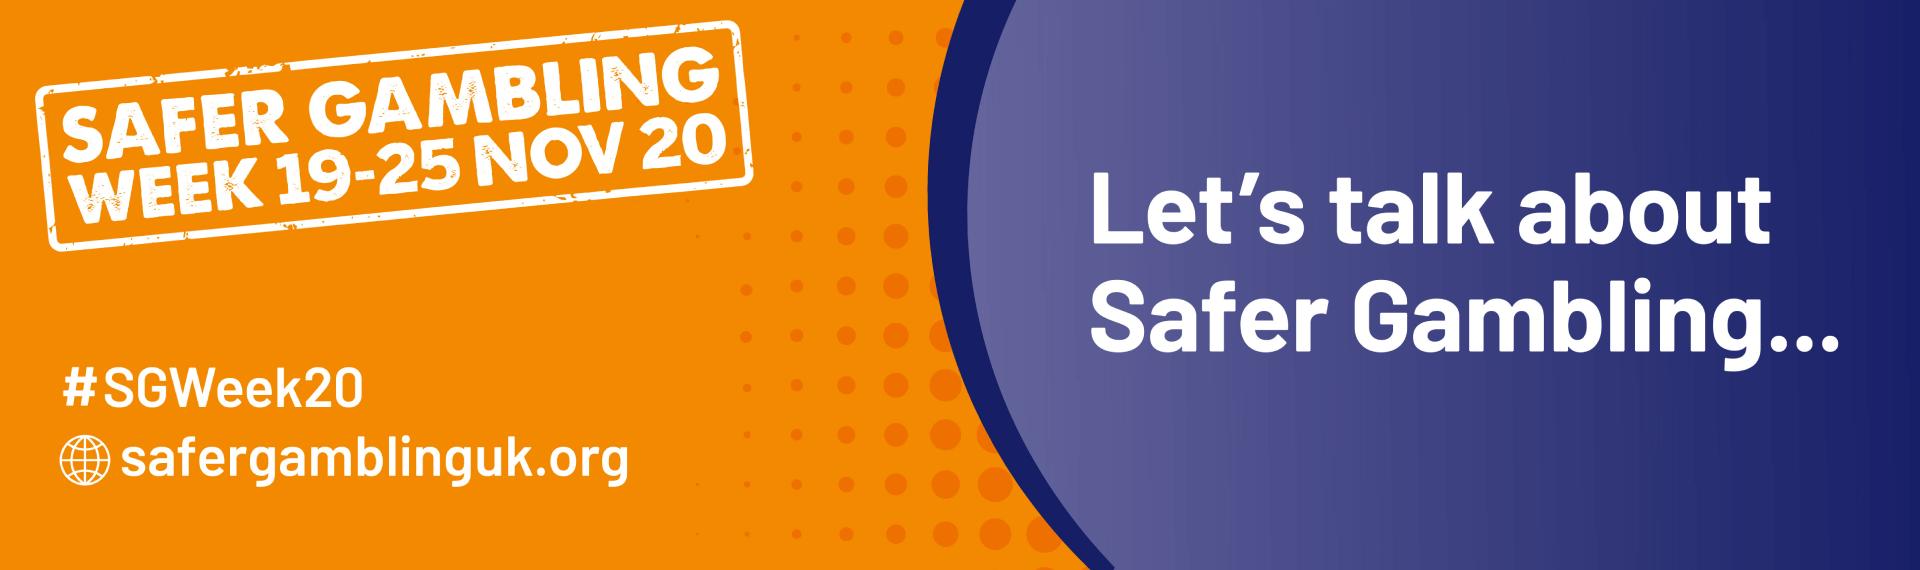 safer-gambling-week-banner